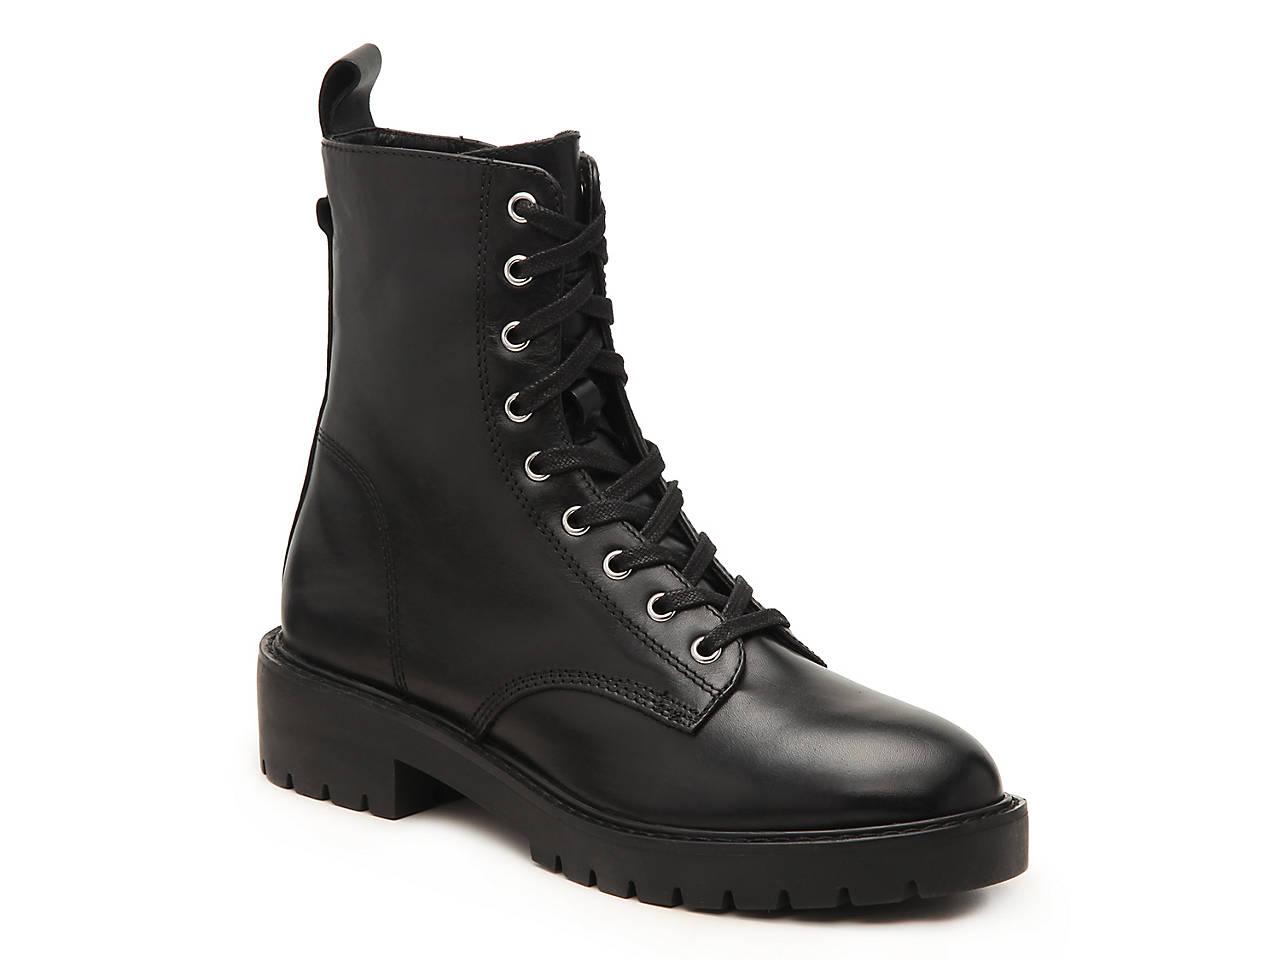 611fae4e1c6 Grid Steve Madden Combat Women s Boot Shoes Dsw FzTwqz5